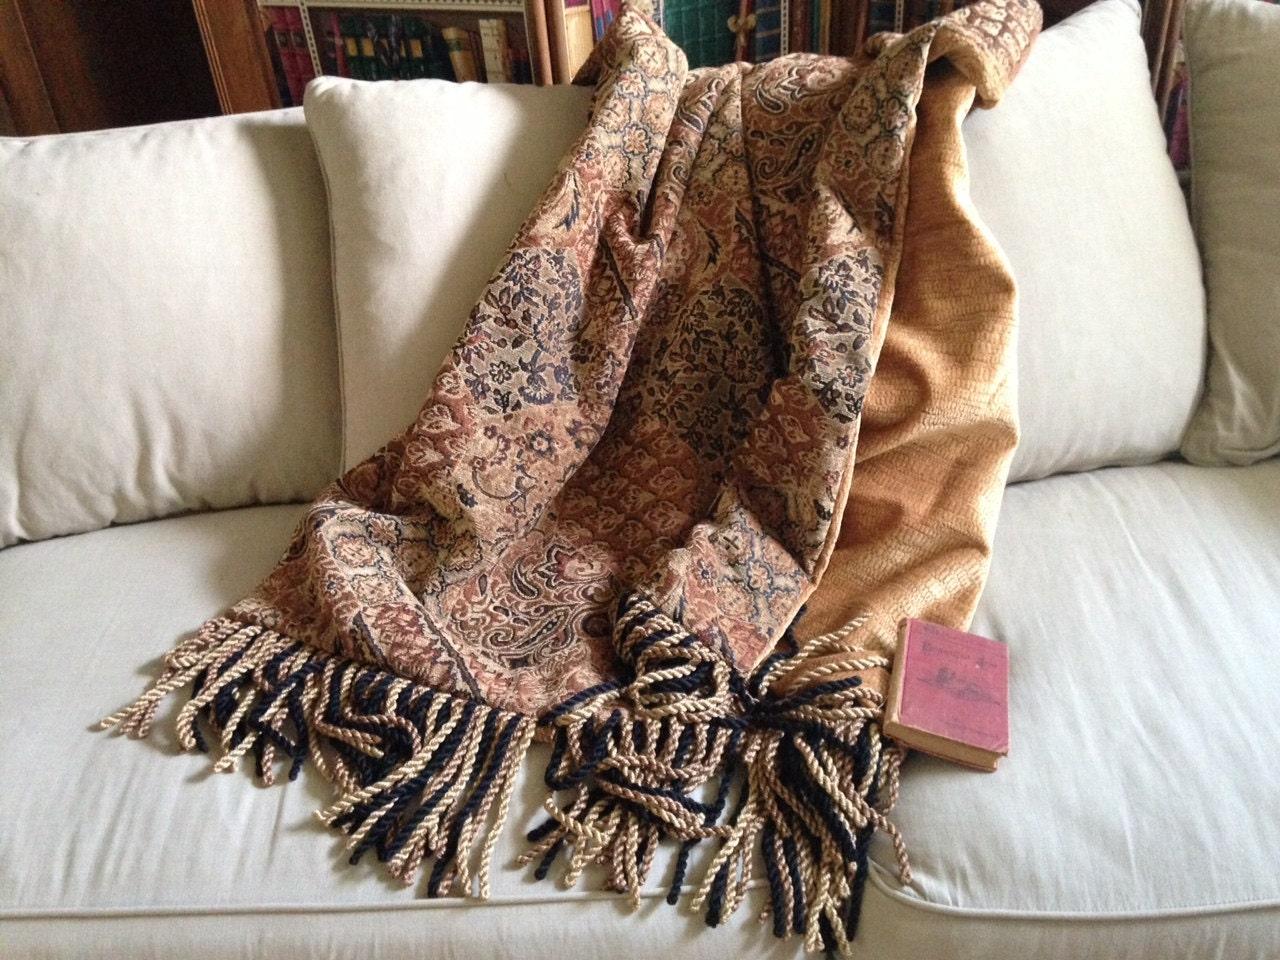 Plush Moroccan Chenille Throw Blanket Black Gold Bronze One